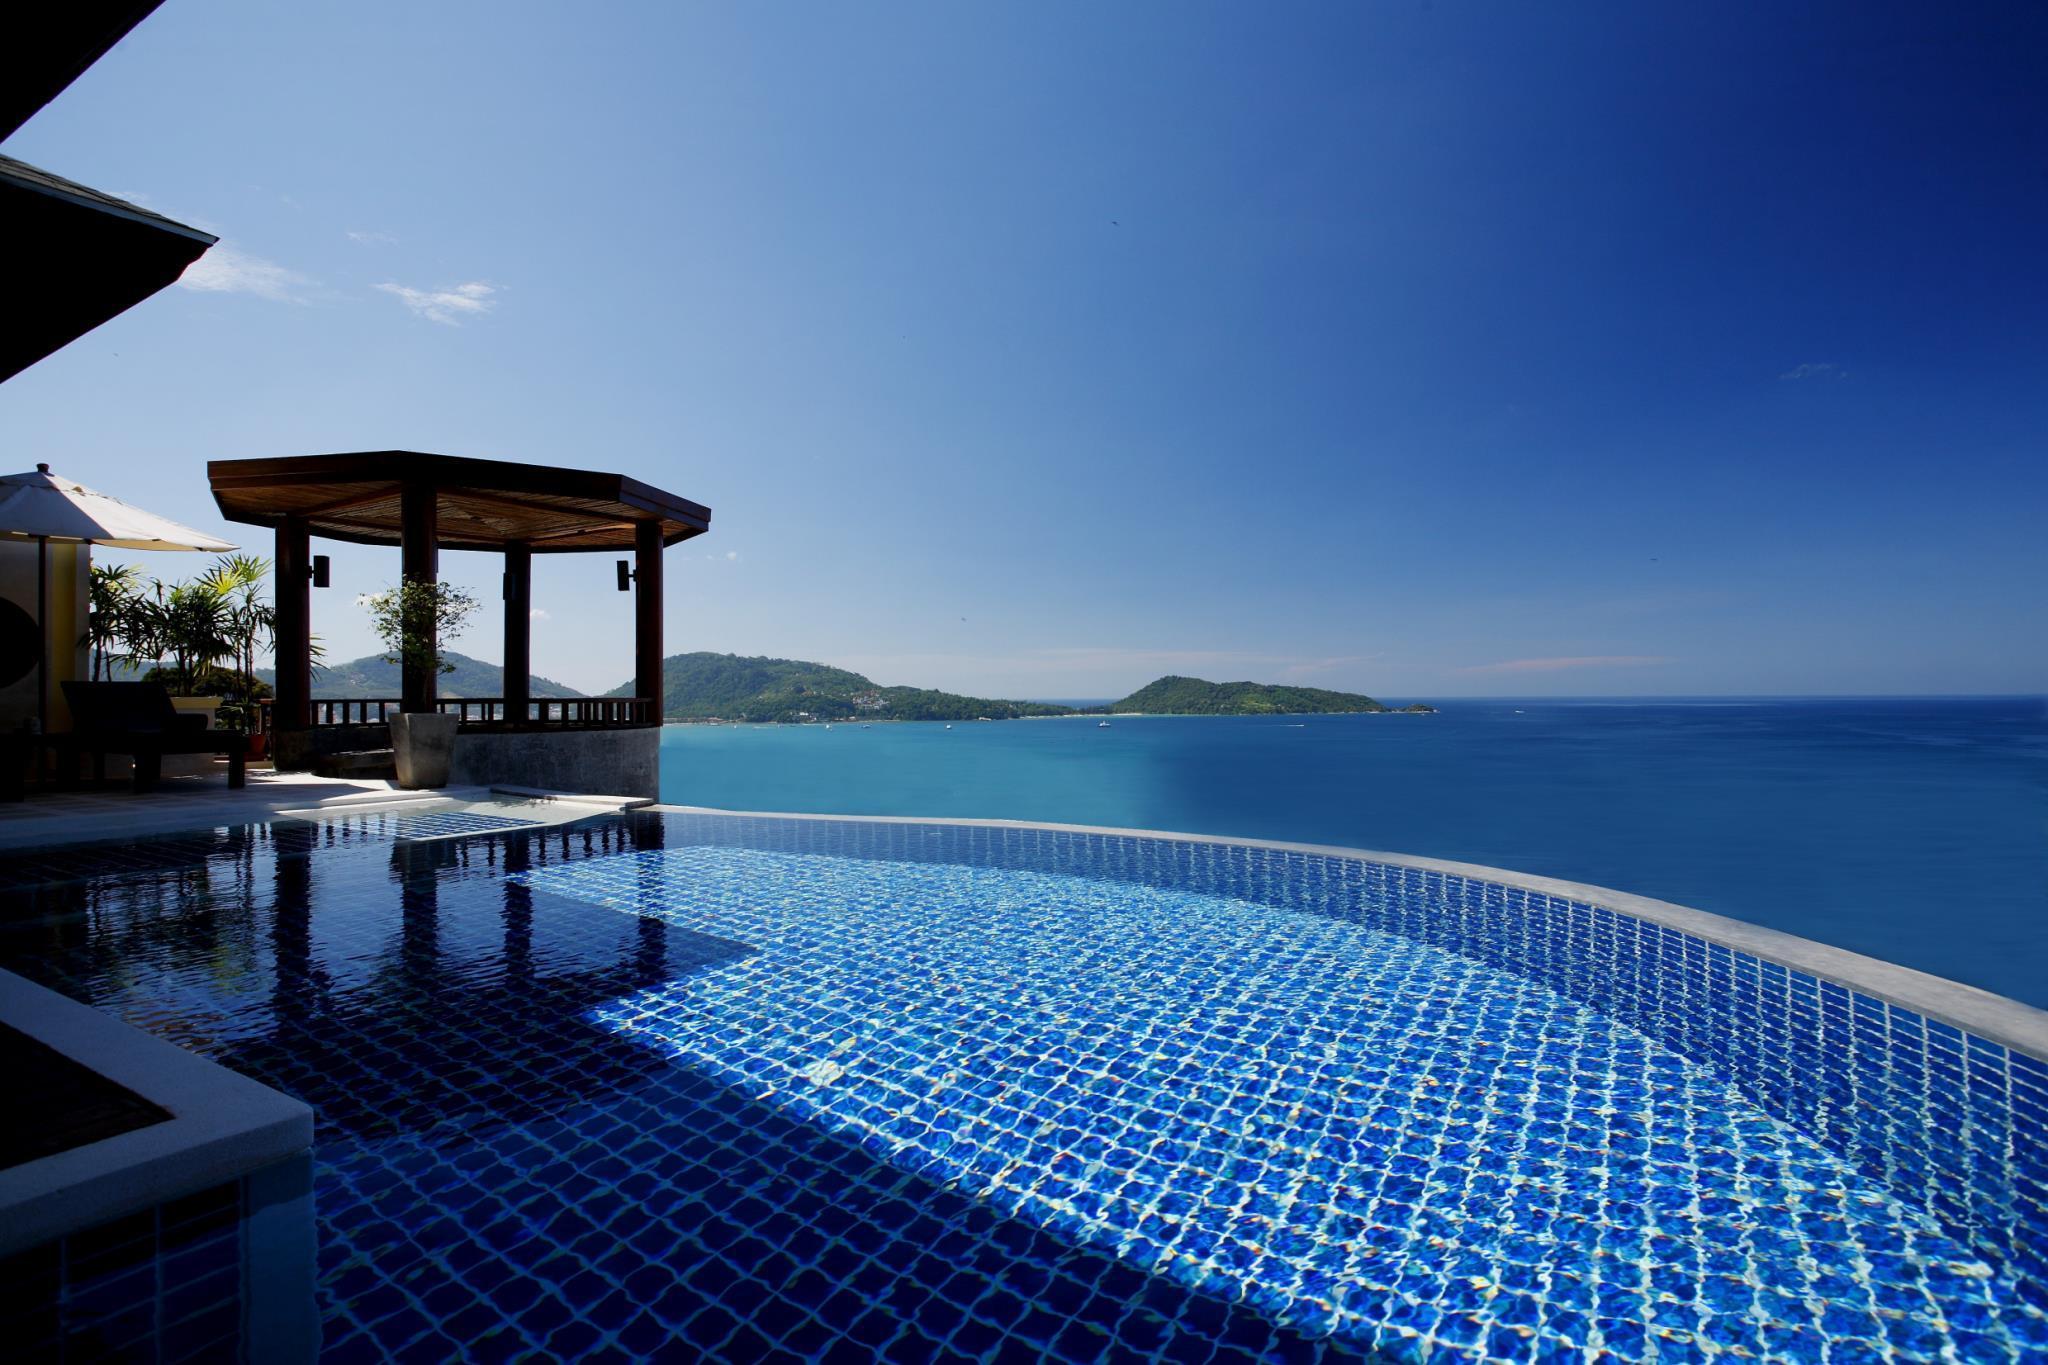 Andamantra Resort and Villa Phuket อันดามันตรา รีสอร์ต แอนด์ วิลลา ภูเก็ต